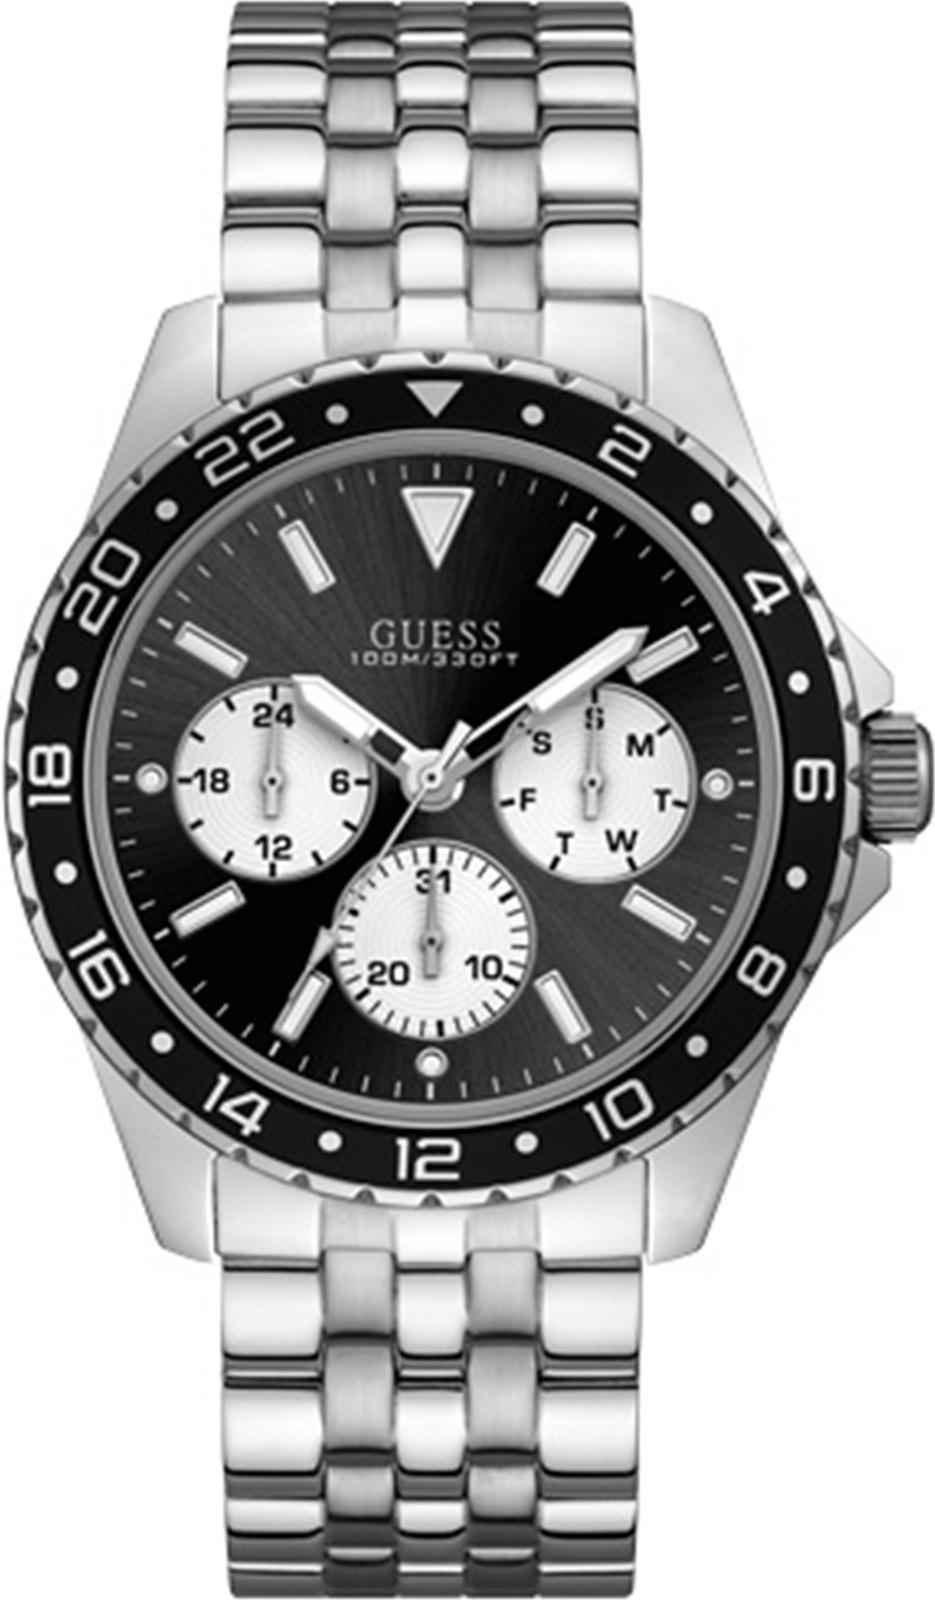 цена Часы Guess ODYSSEY онлайн в 2017 году